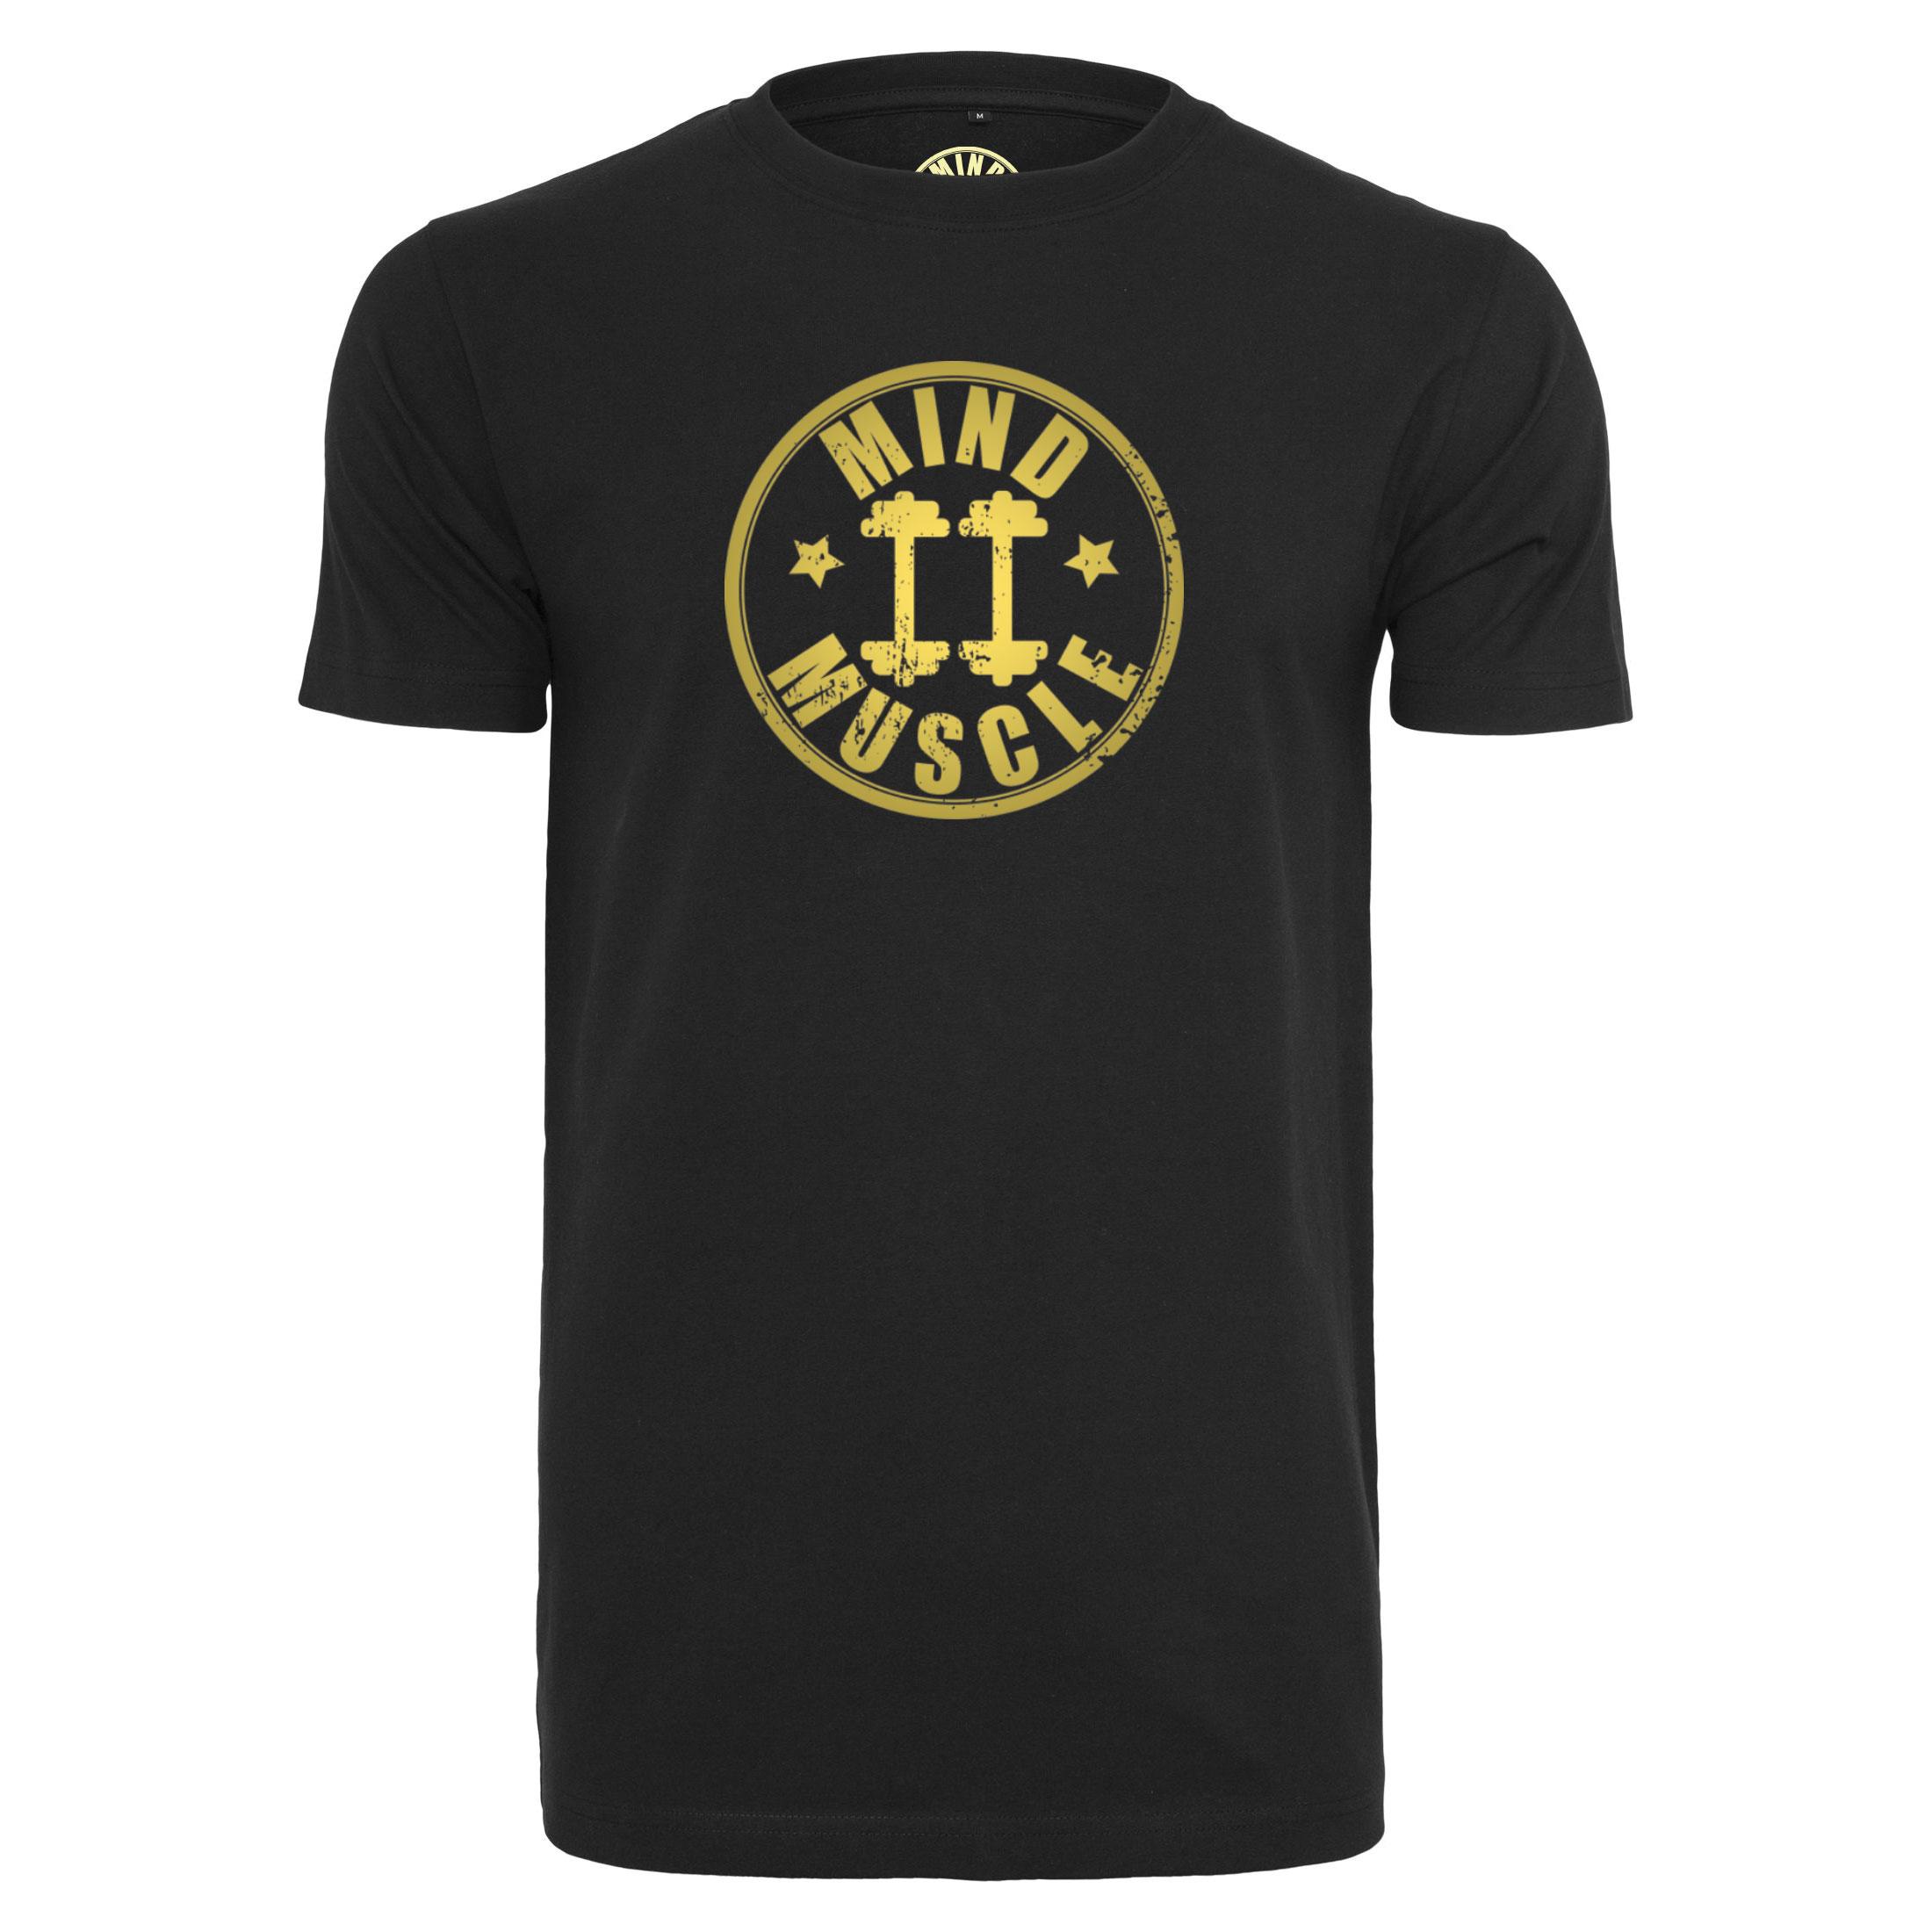 43b99cef6fa Heren fitness logo t shirt goud metallic